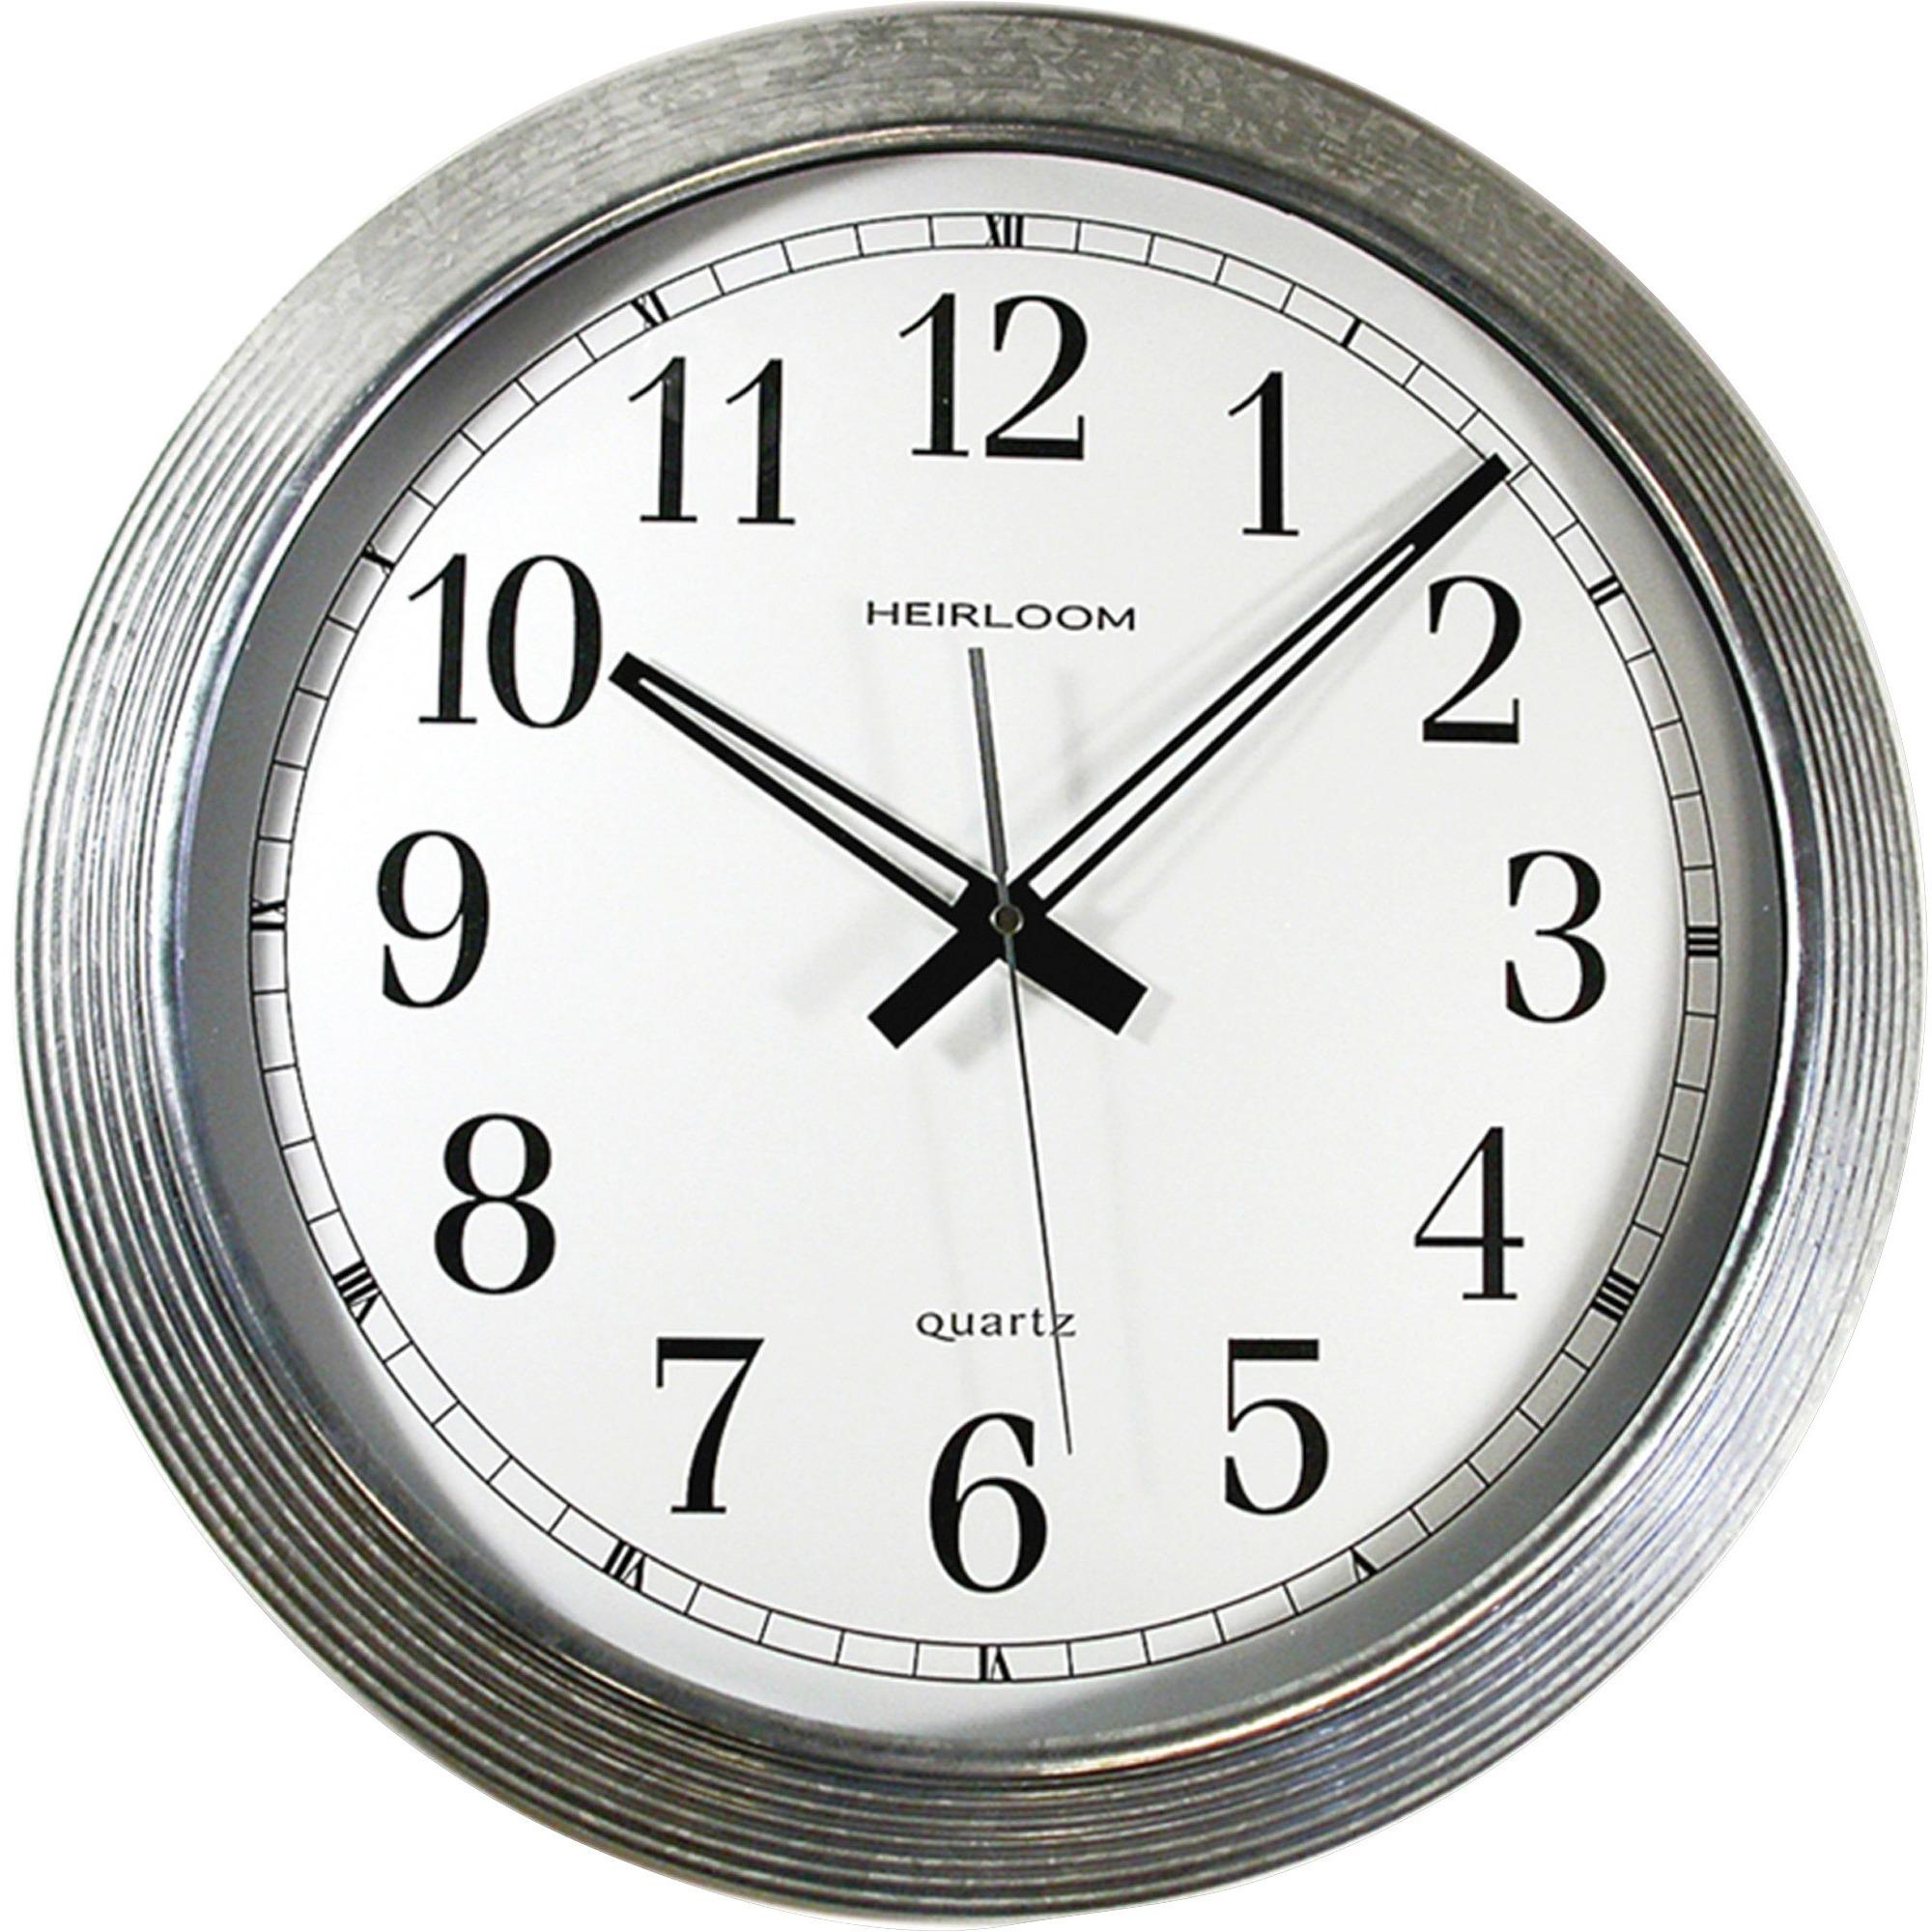 "Artistic 16"" Galvanized Metal Round Wall Clock"